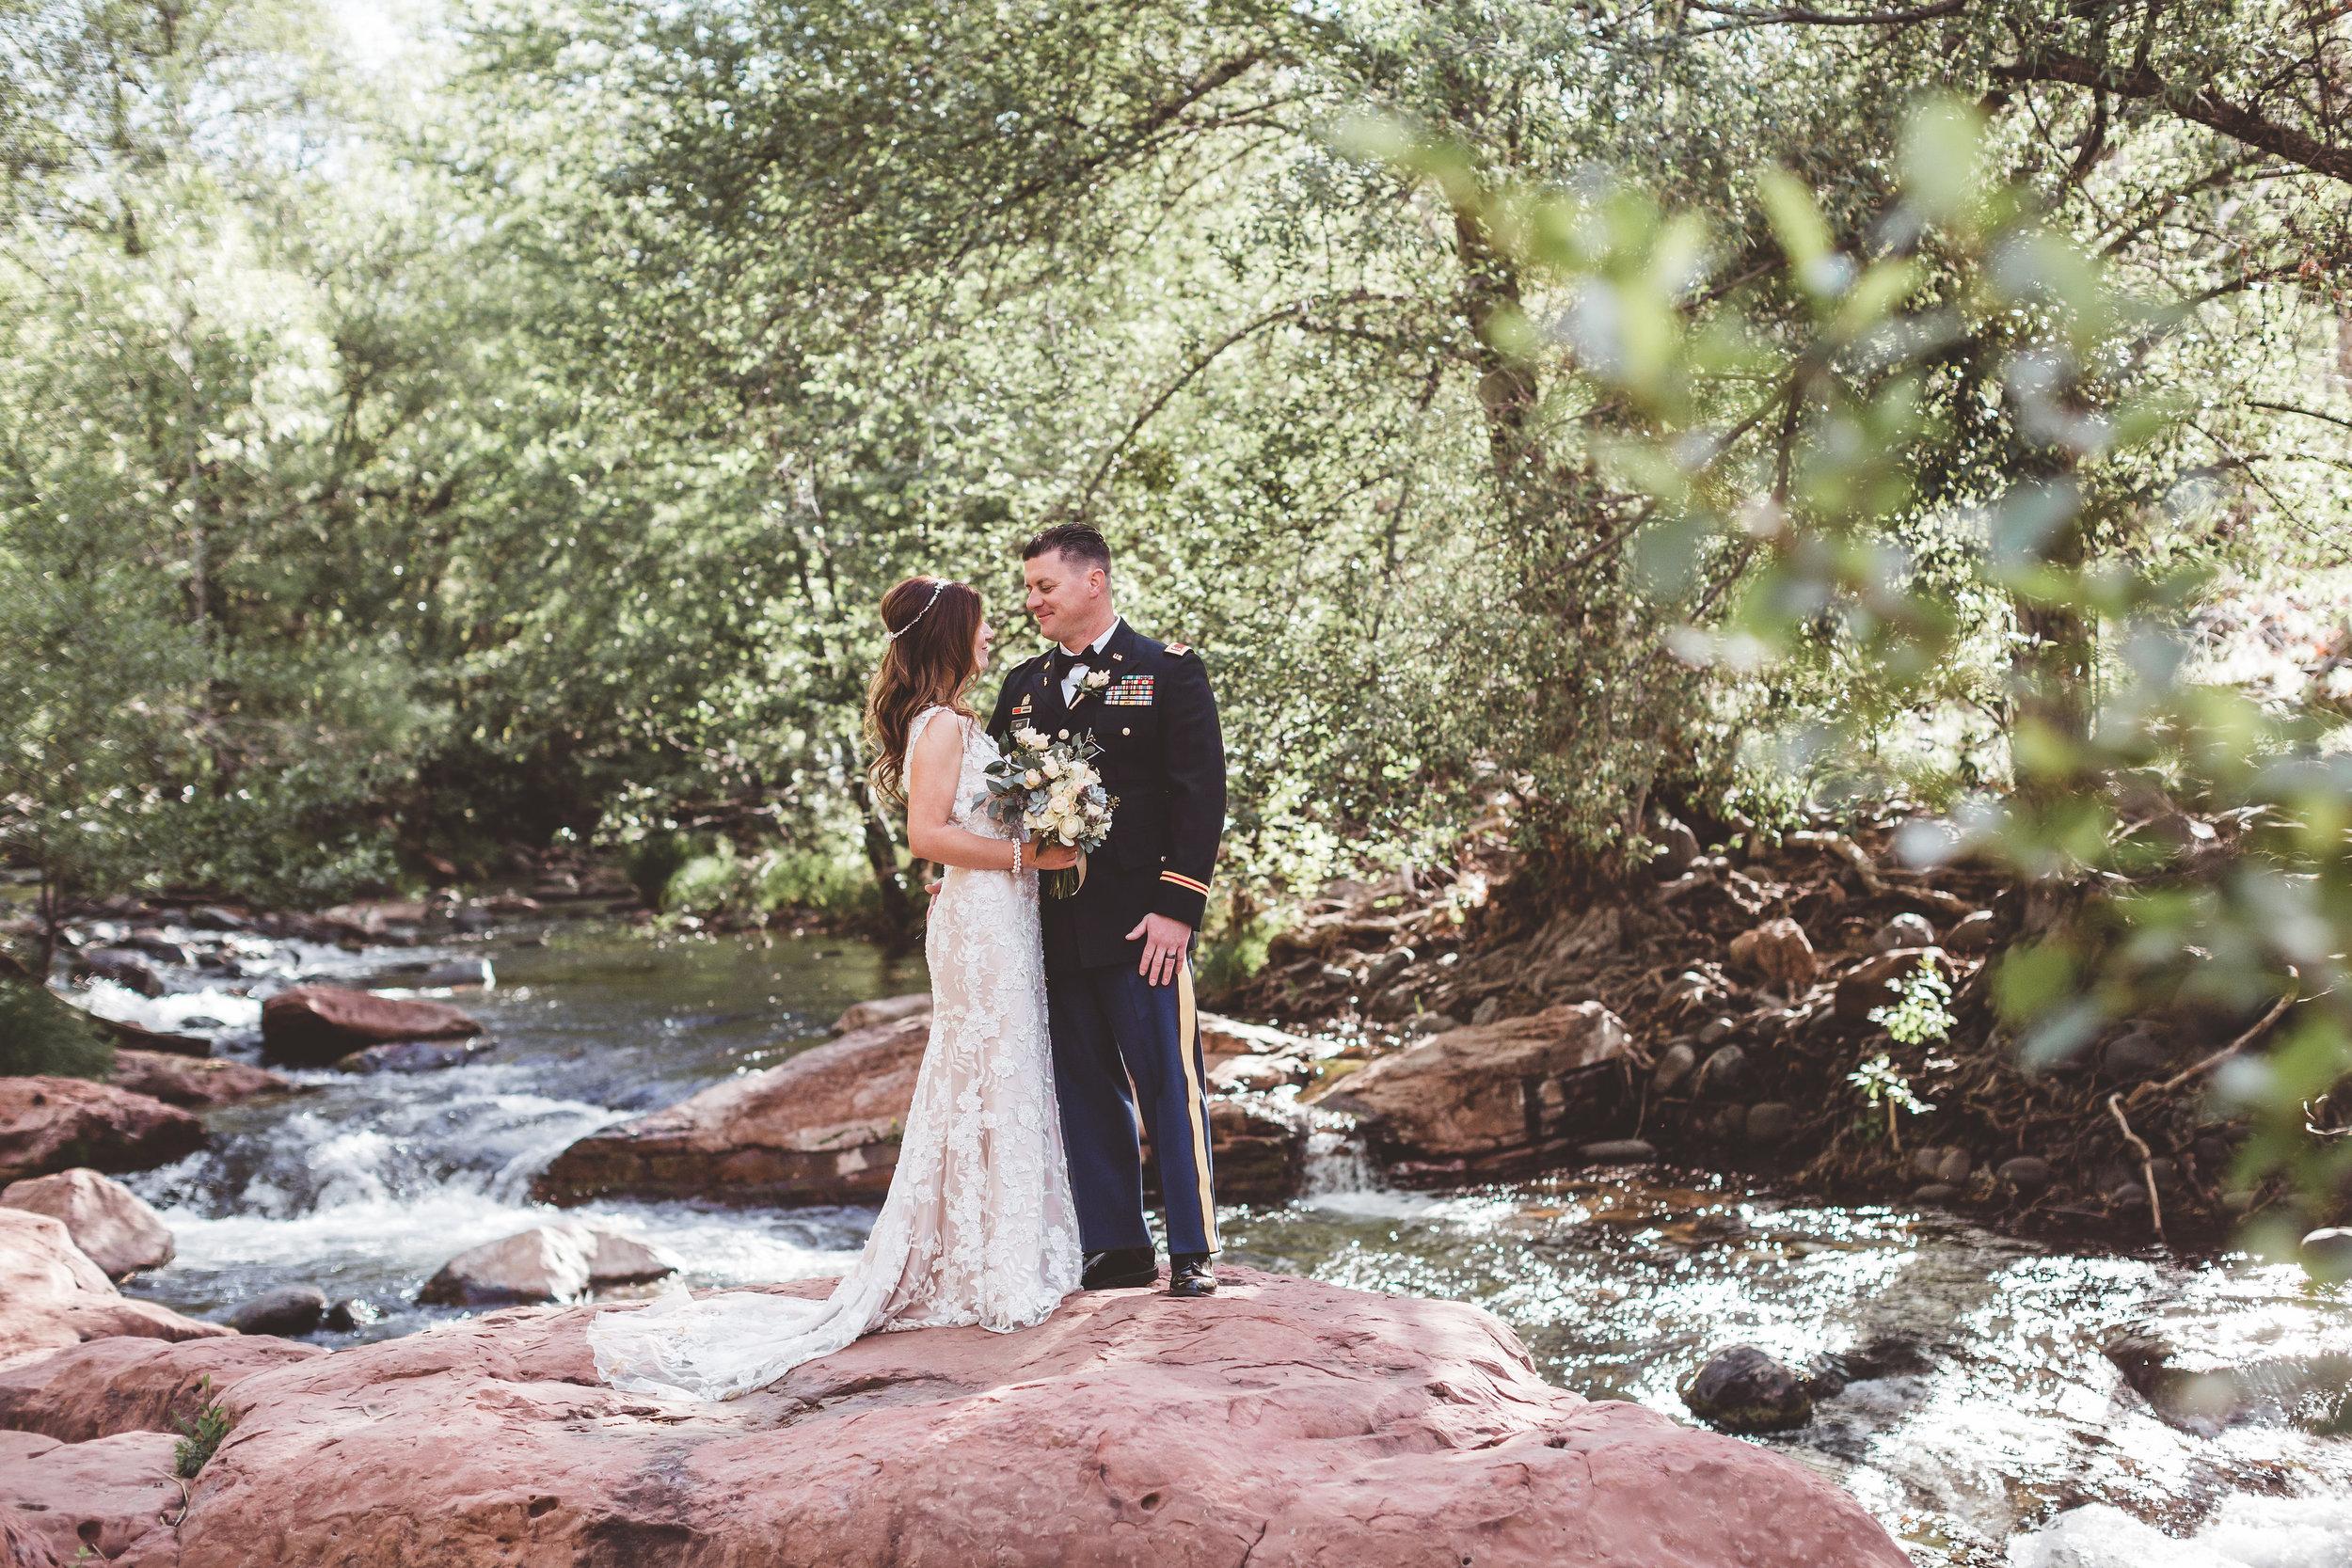 jenna-and-erics-romantic-sedona-wedding28.jpg